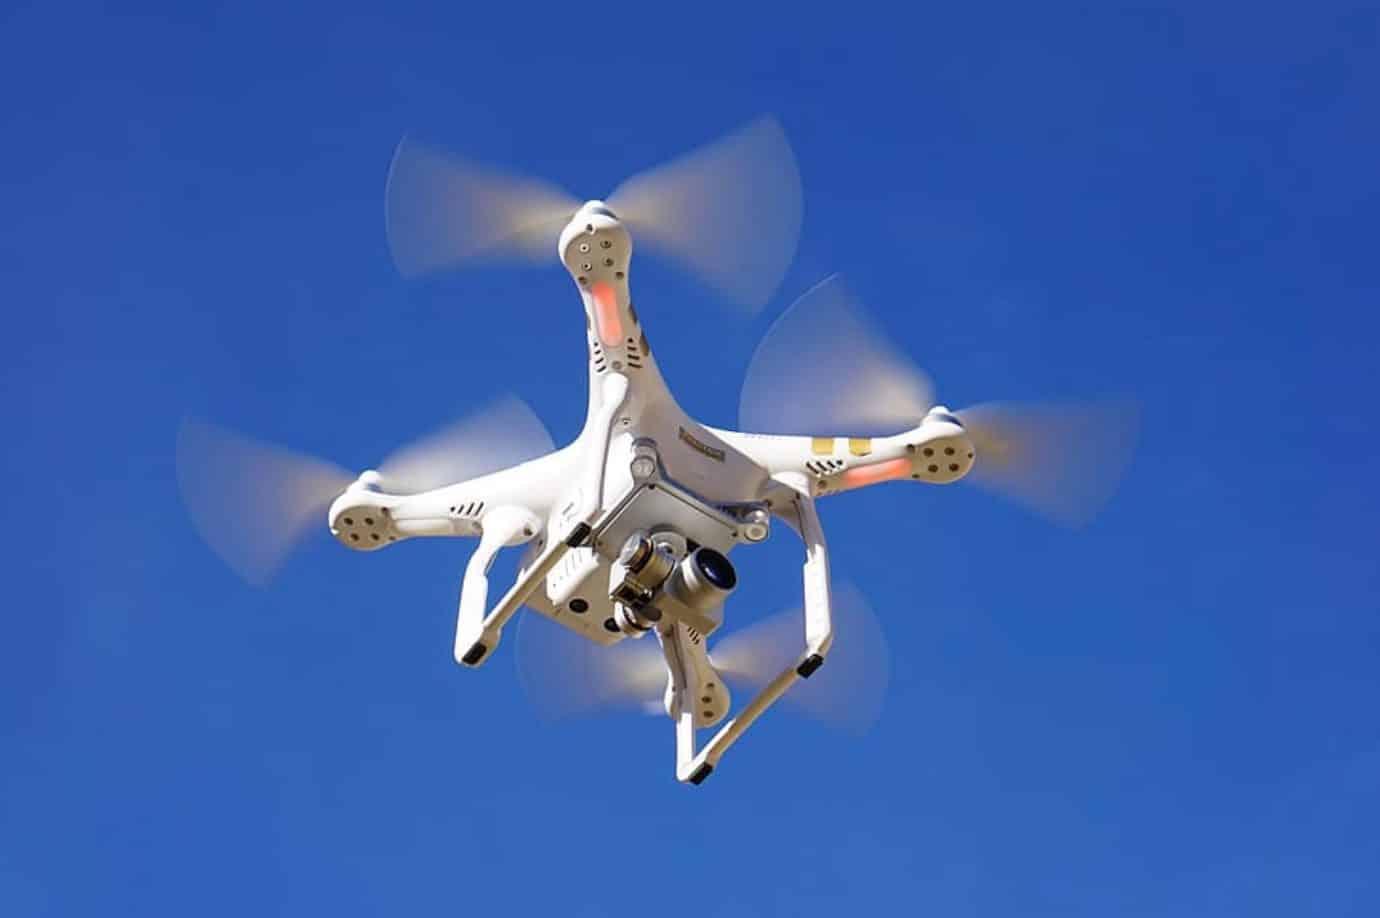 DJI Mavic 2 Pro and Phantom 4 Pro among the police drones used in Arizona